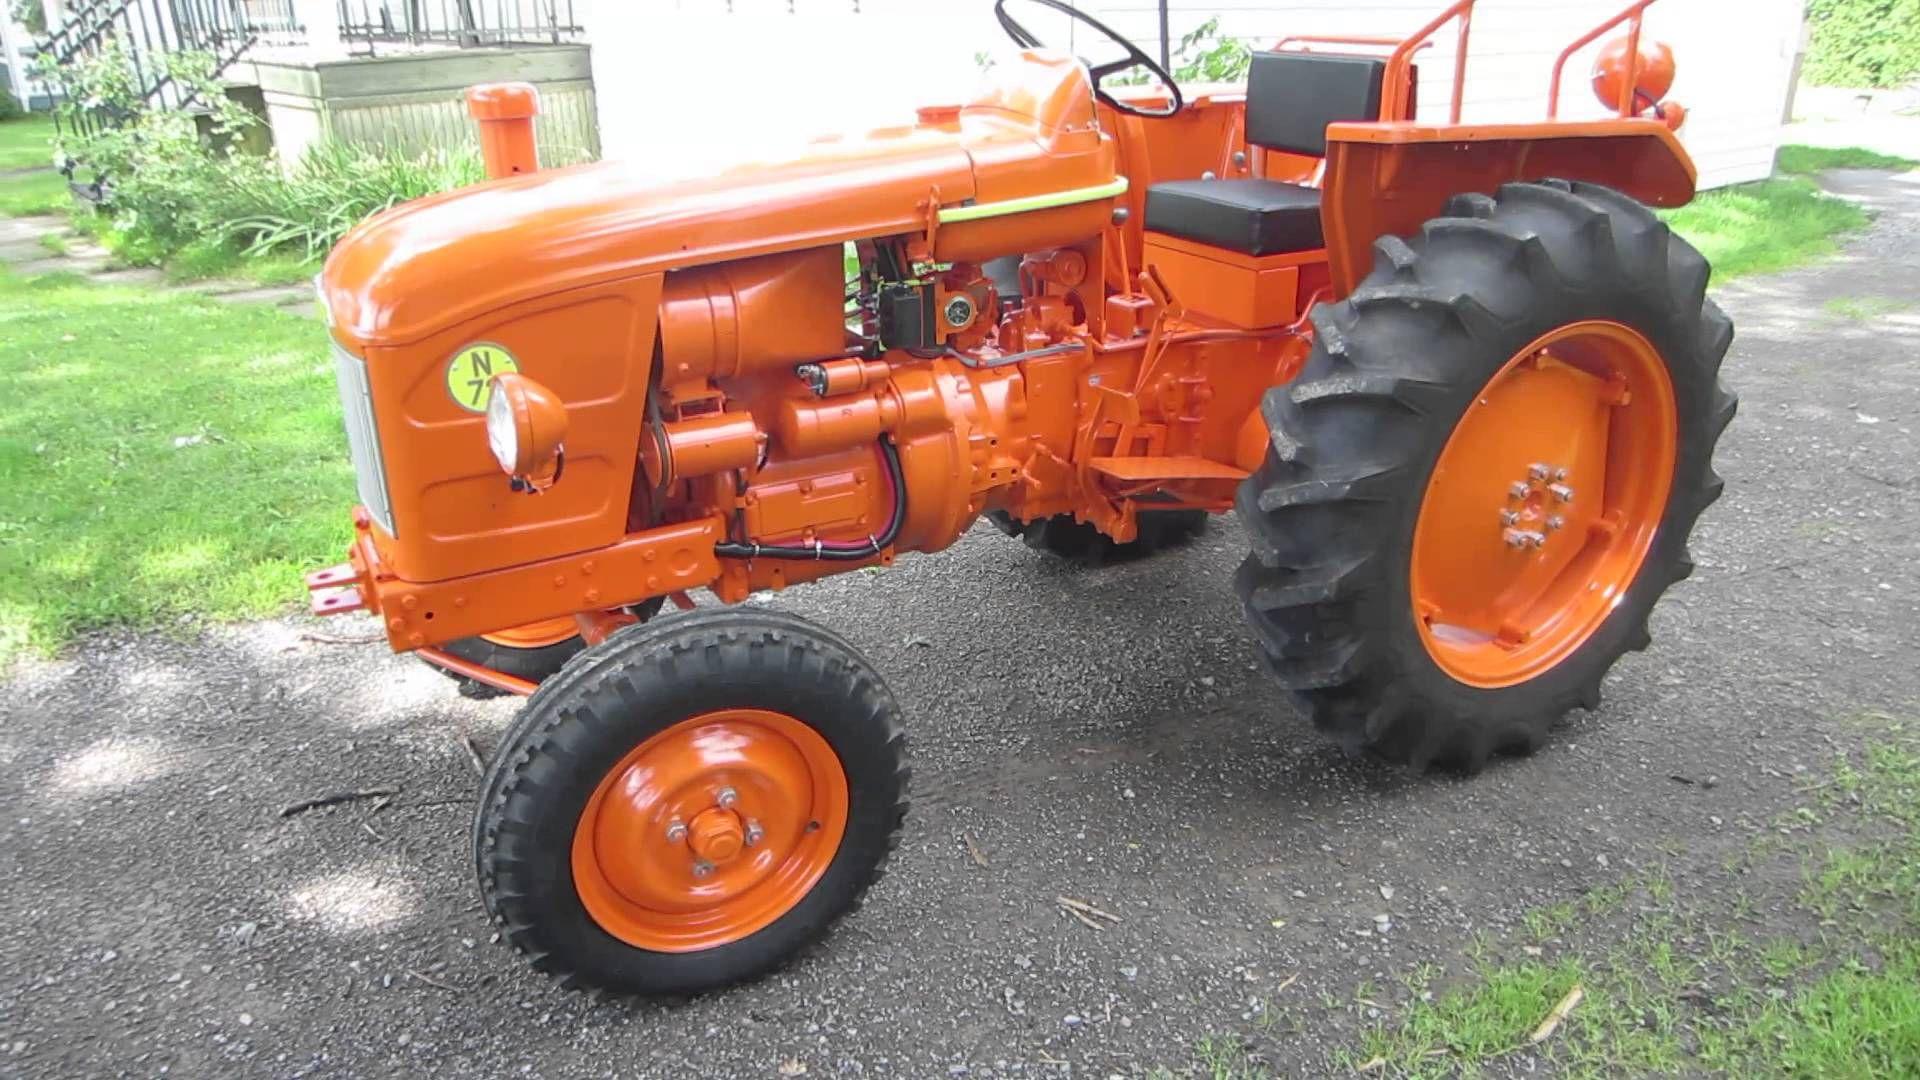 Renault N72 Tracteurs D Epoque Tracteur Ancien Tracteur Agricole